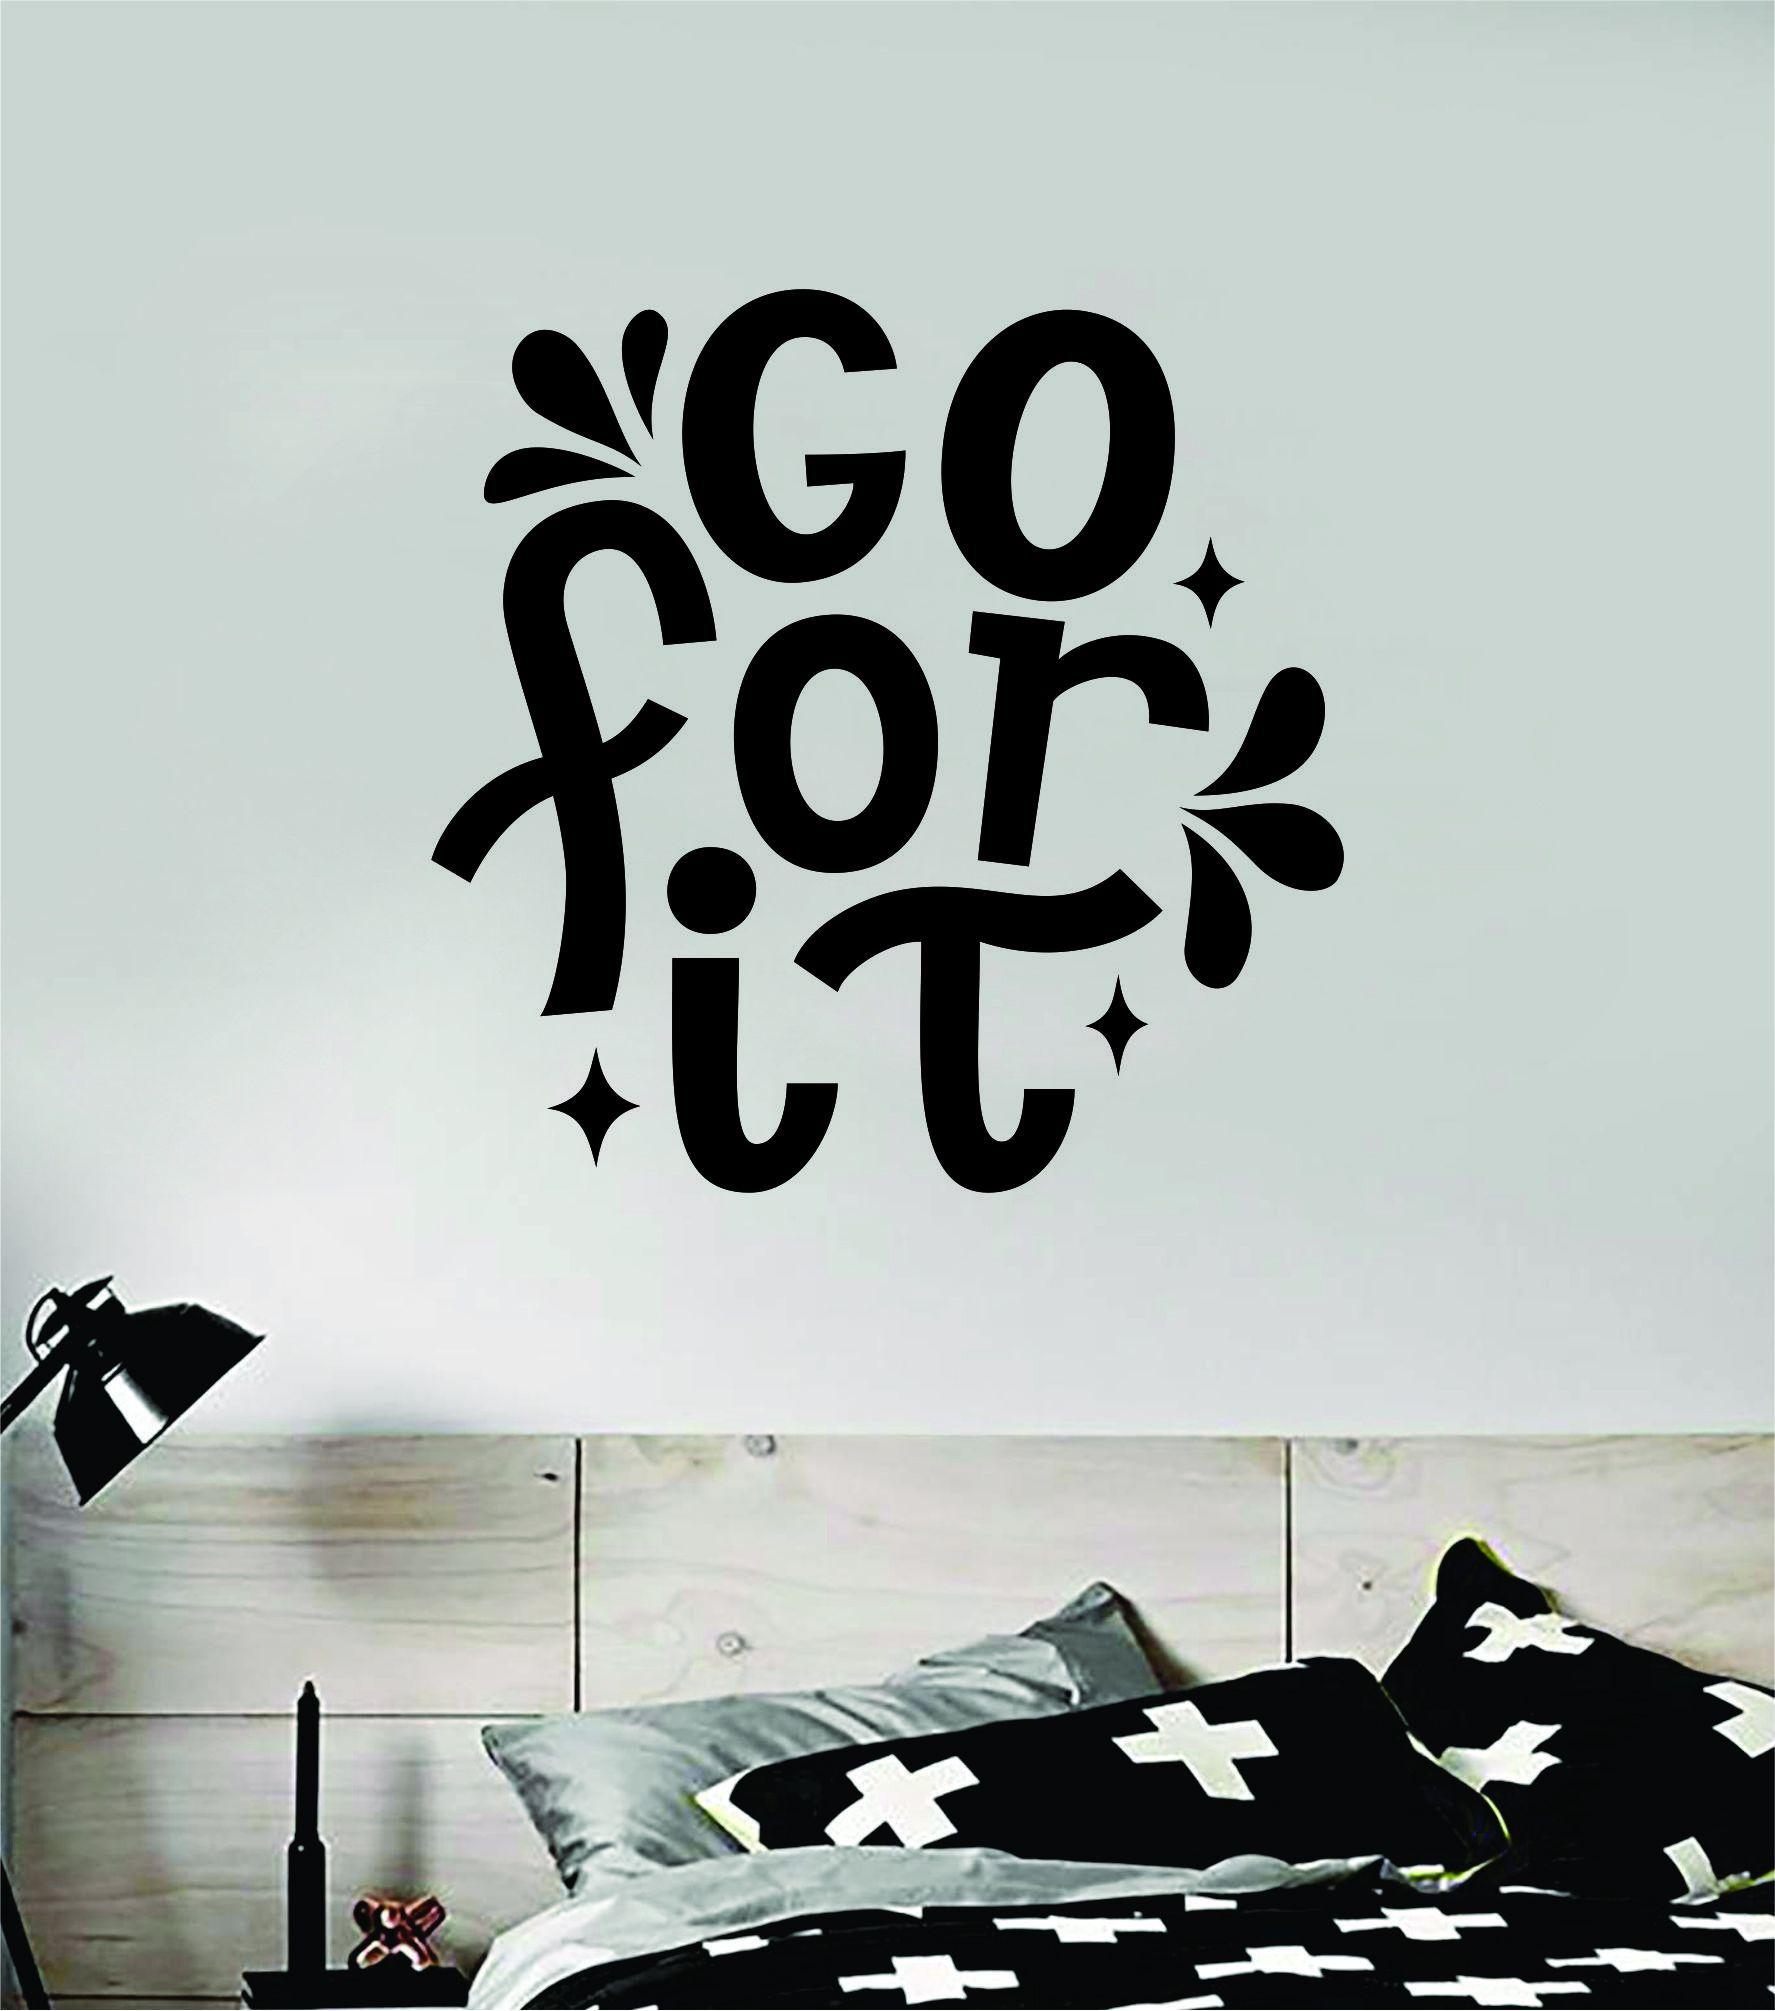 Go For It Wall Decal Sticker Vinyl Art Bedroom Room Home Decor Inspirational Motivational Teen Baby Nursery School - black